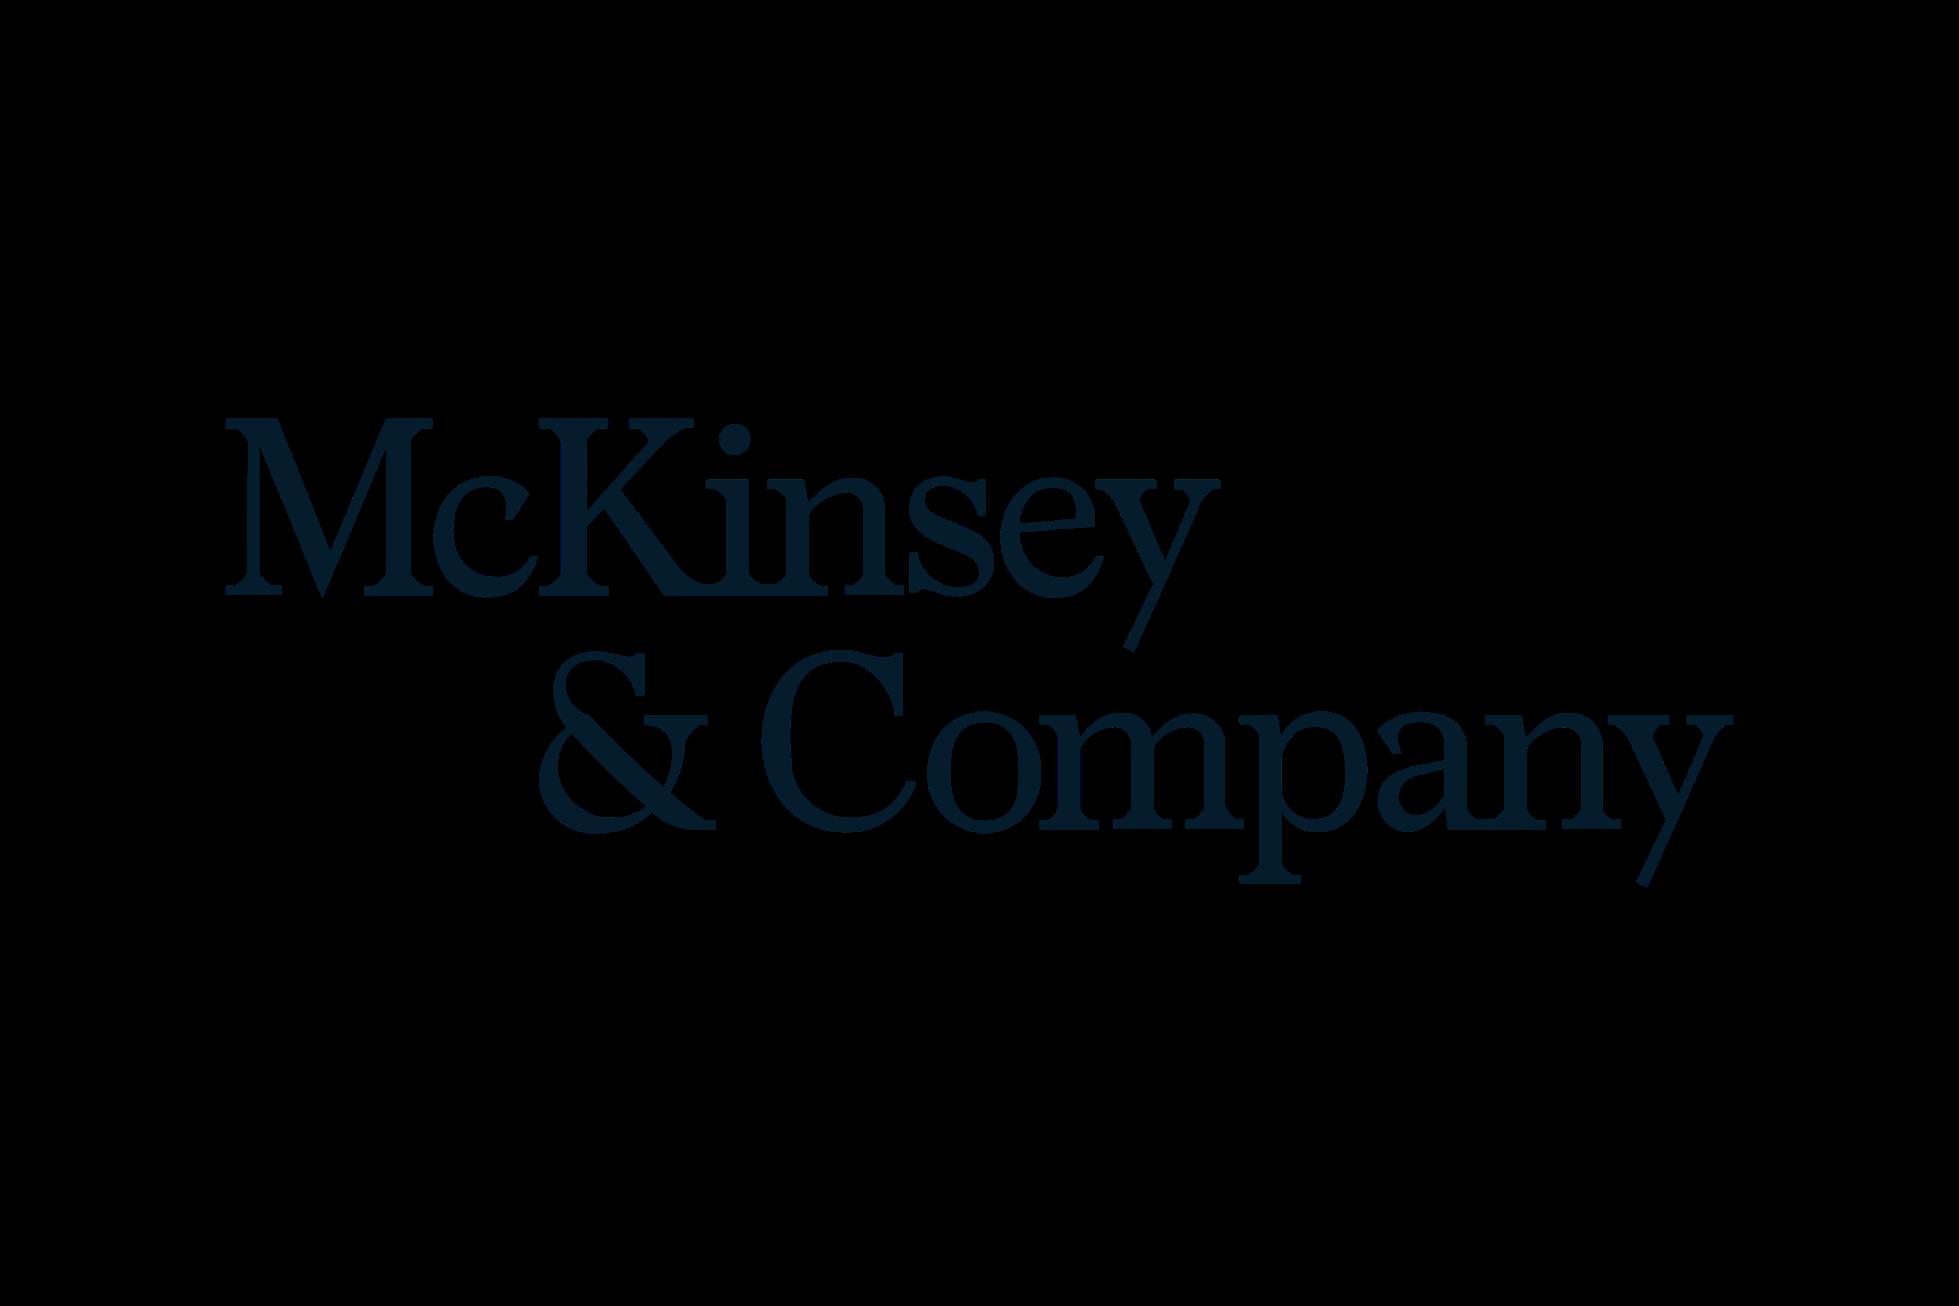 Mckinsey & company logo.wine